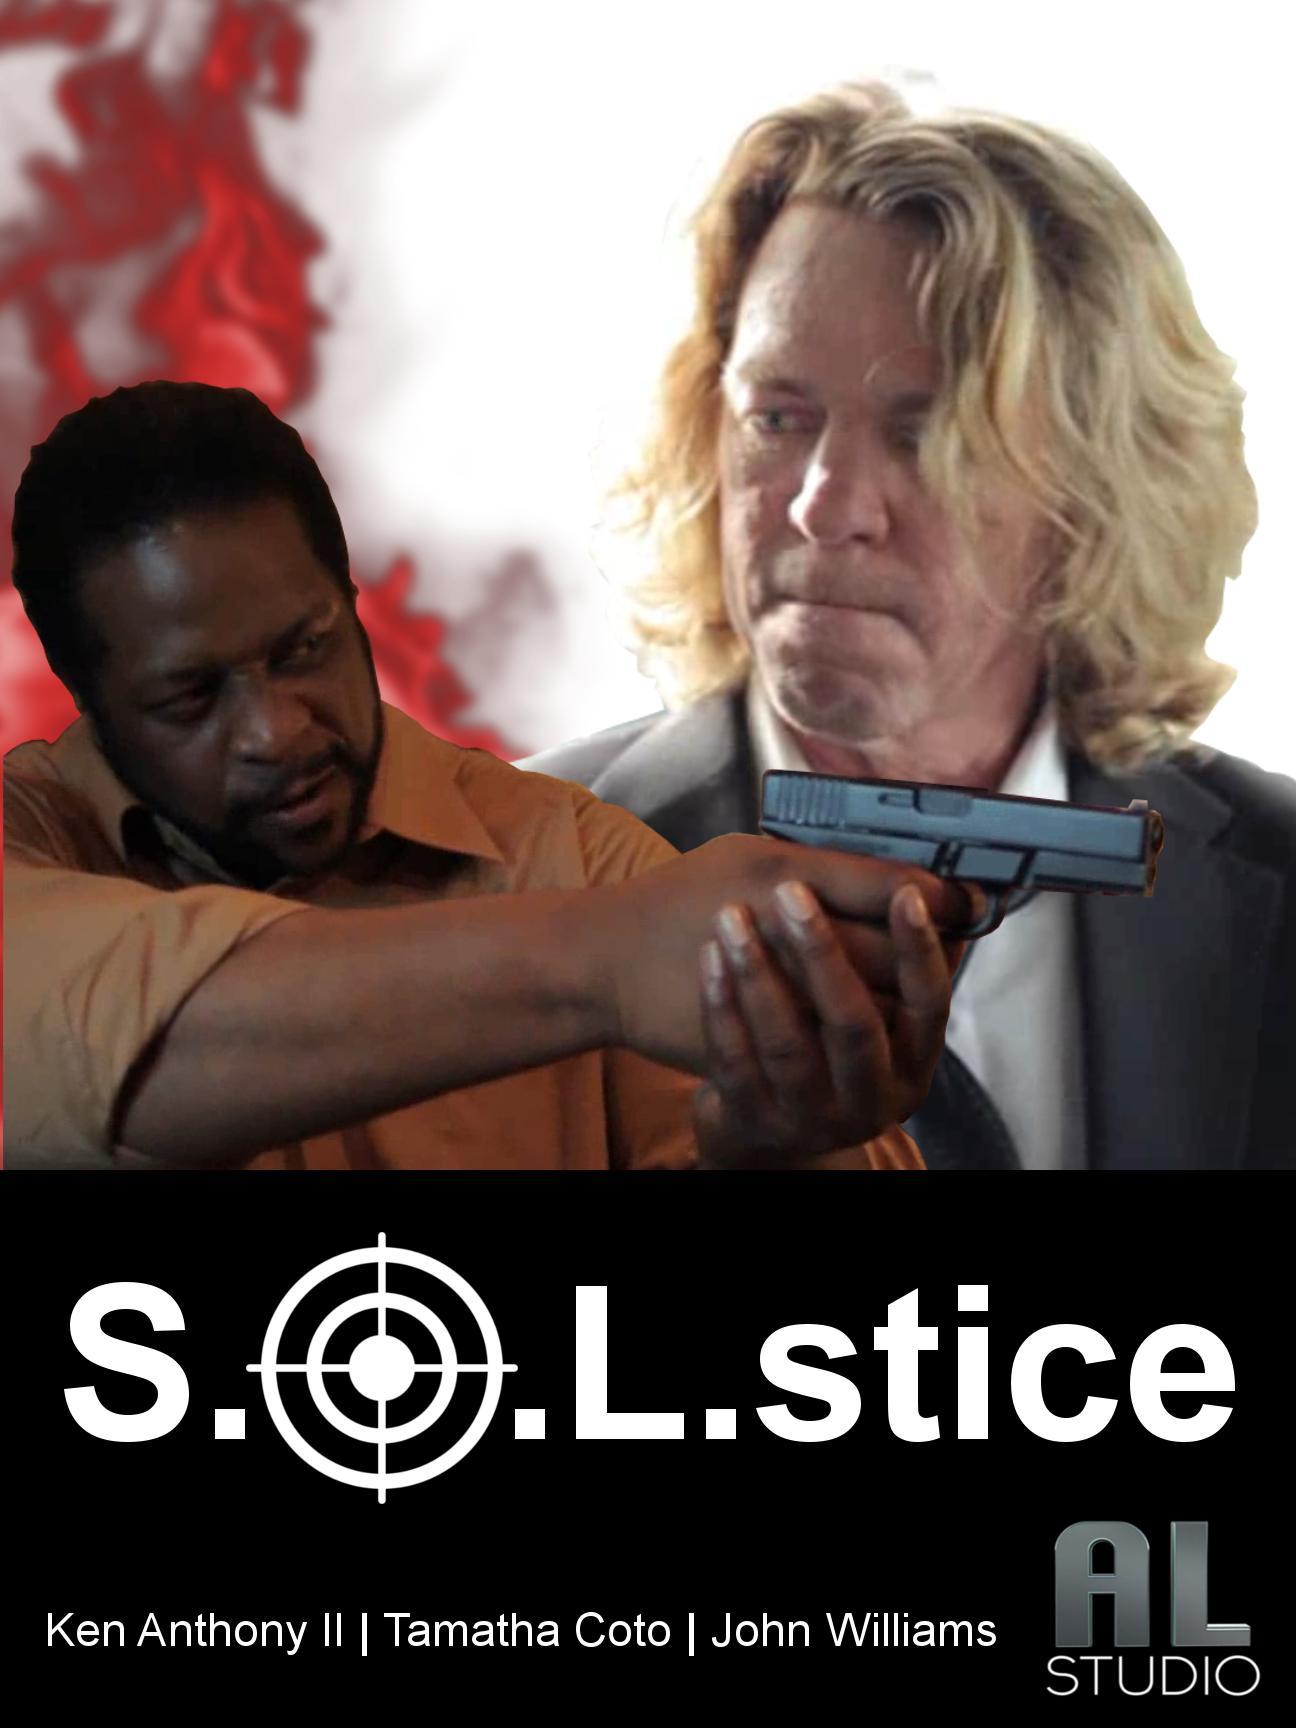 S.O.L.stice (2014)